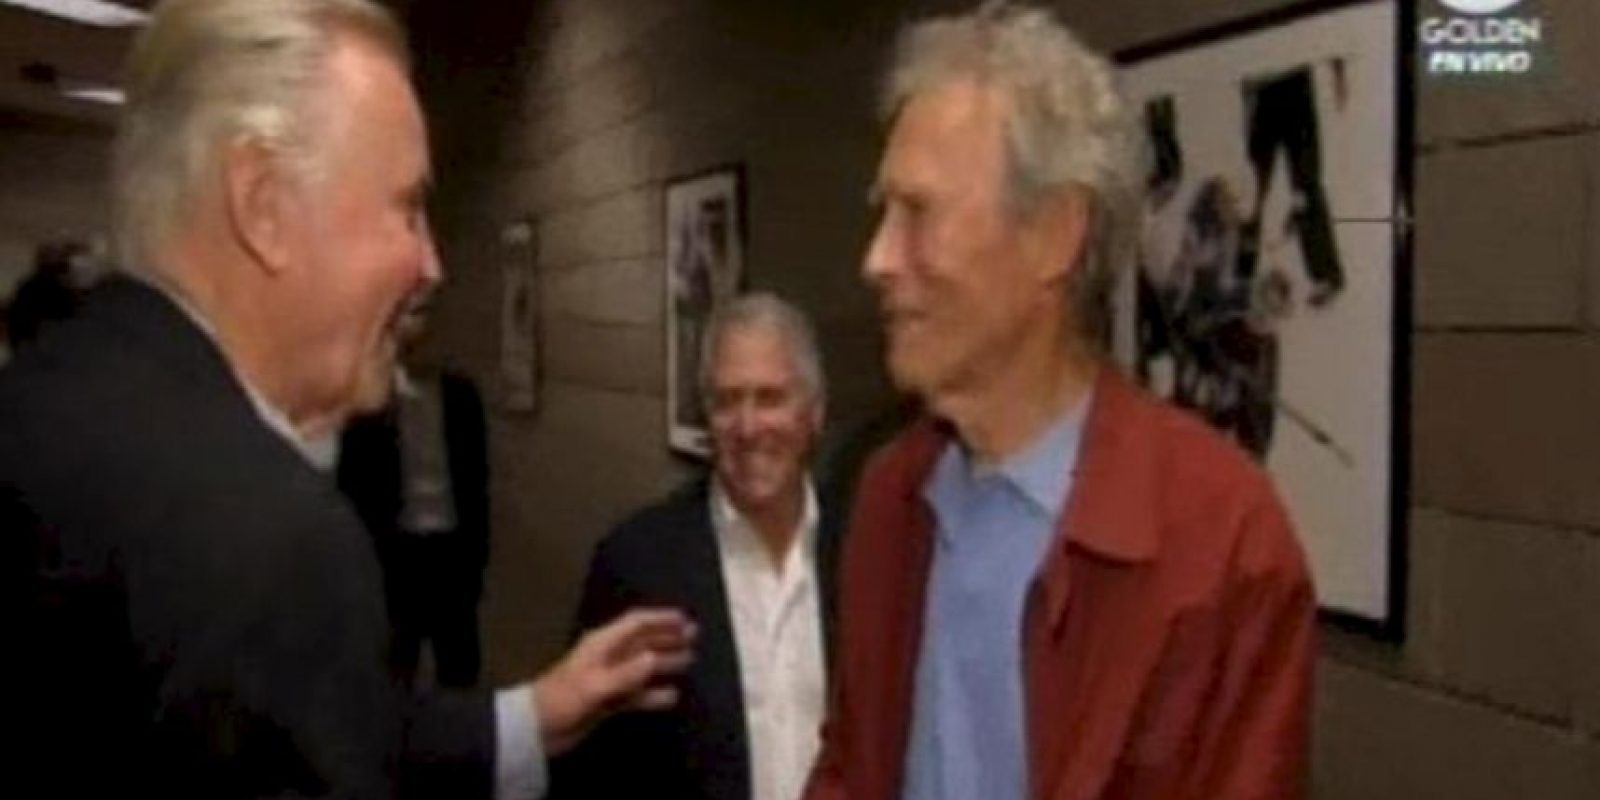 El director y actor Clint Eastwood junto a John Voight Foto:Getty Images